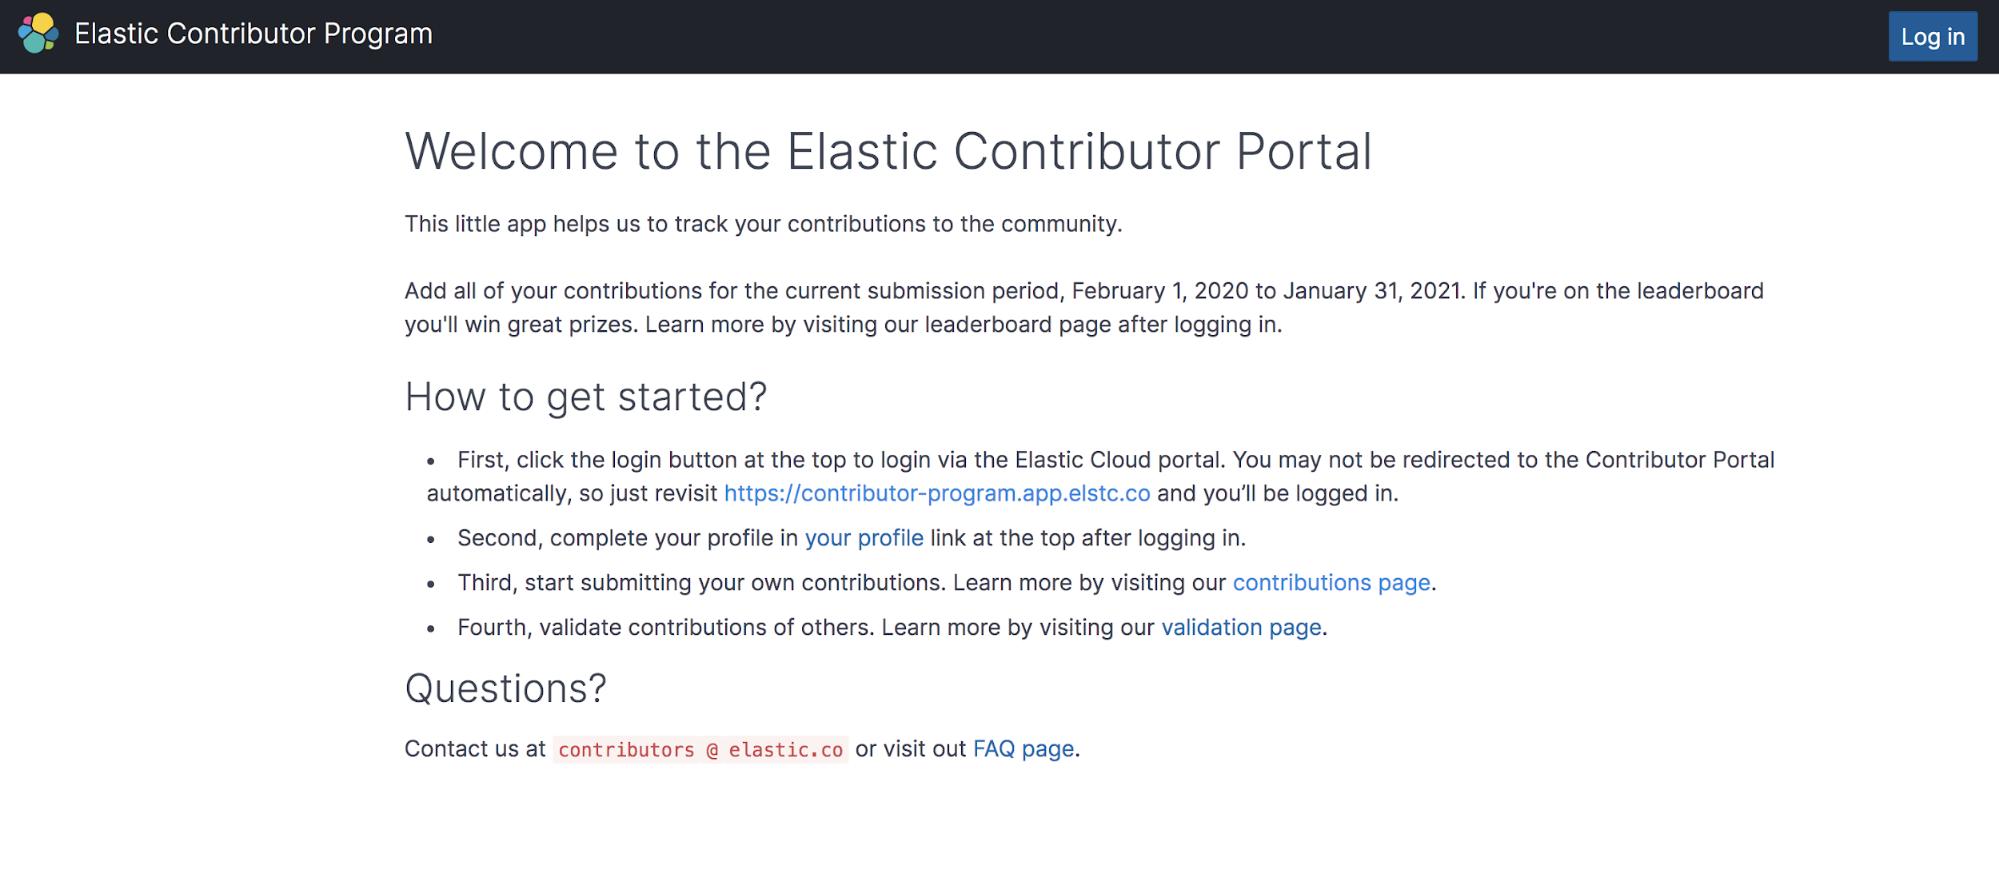 Elastic Contributor Program welcome screen